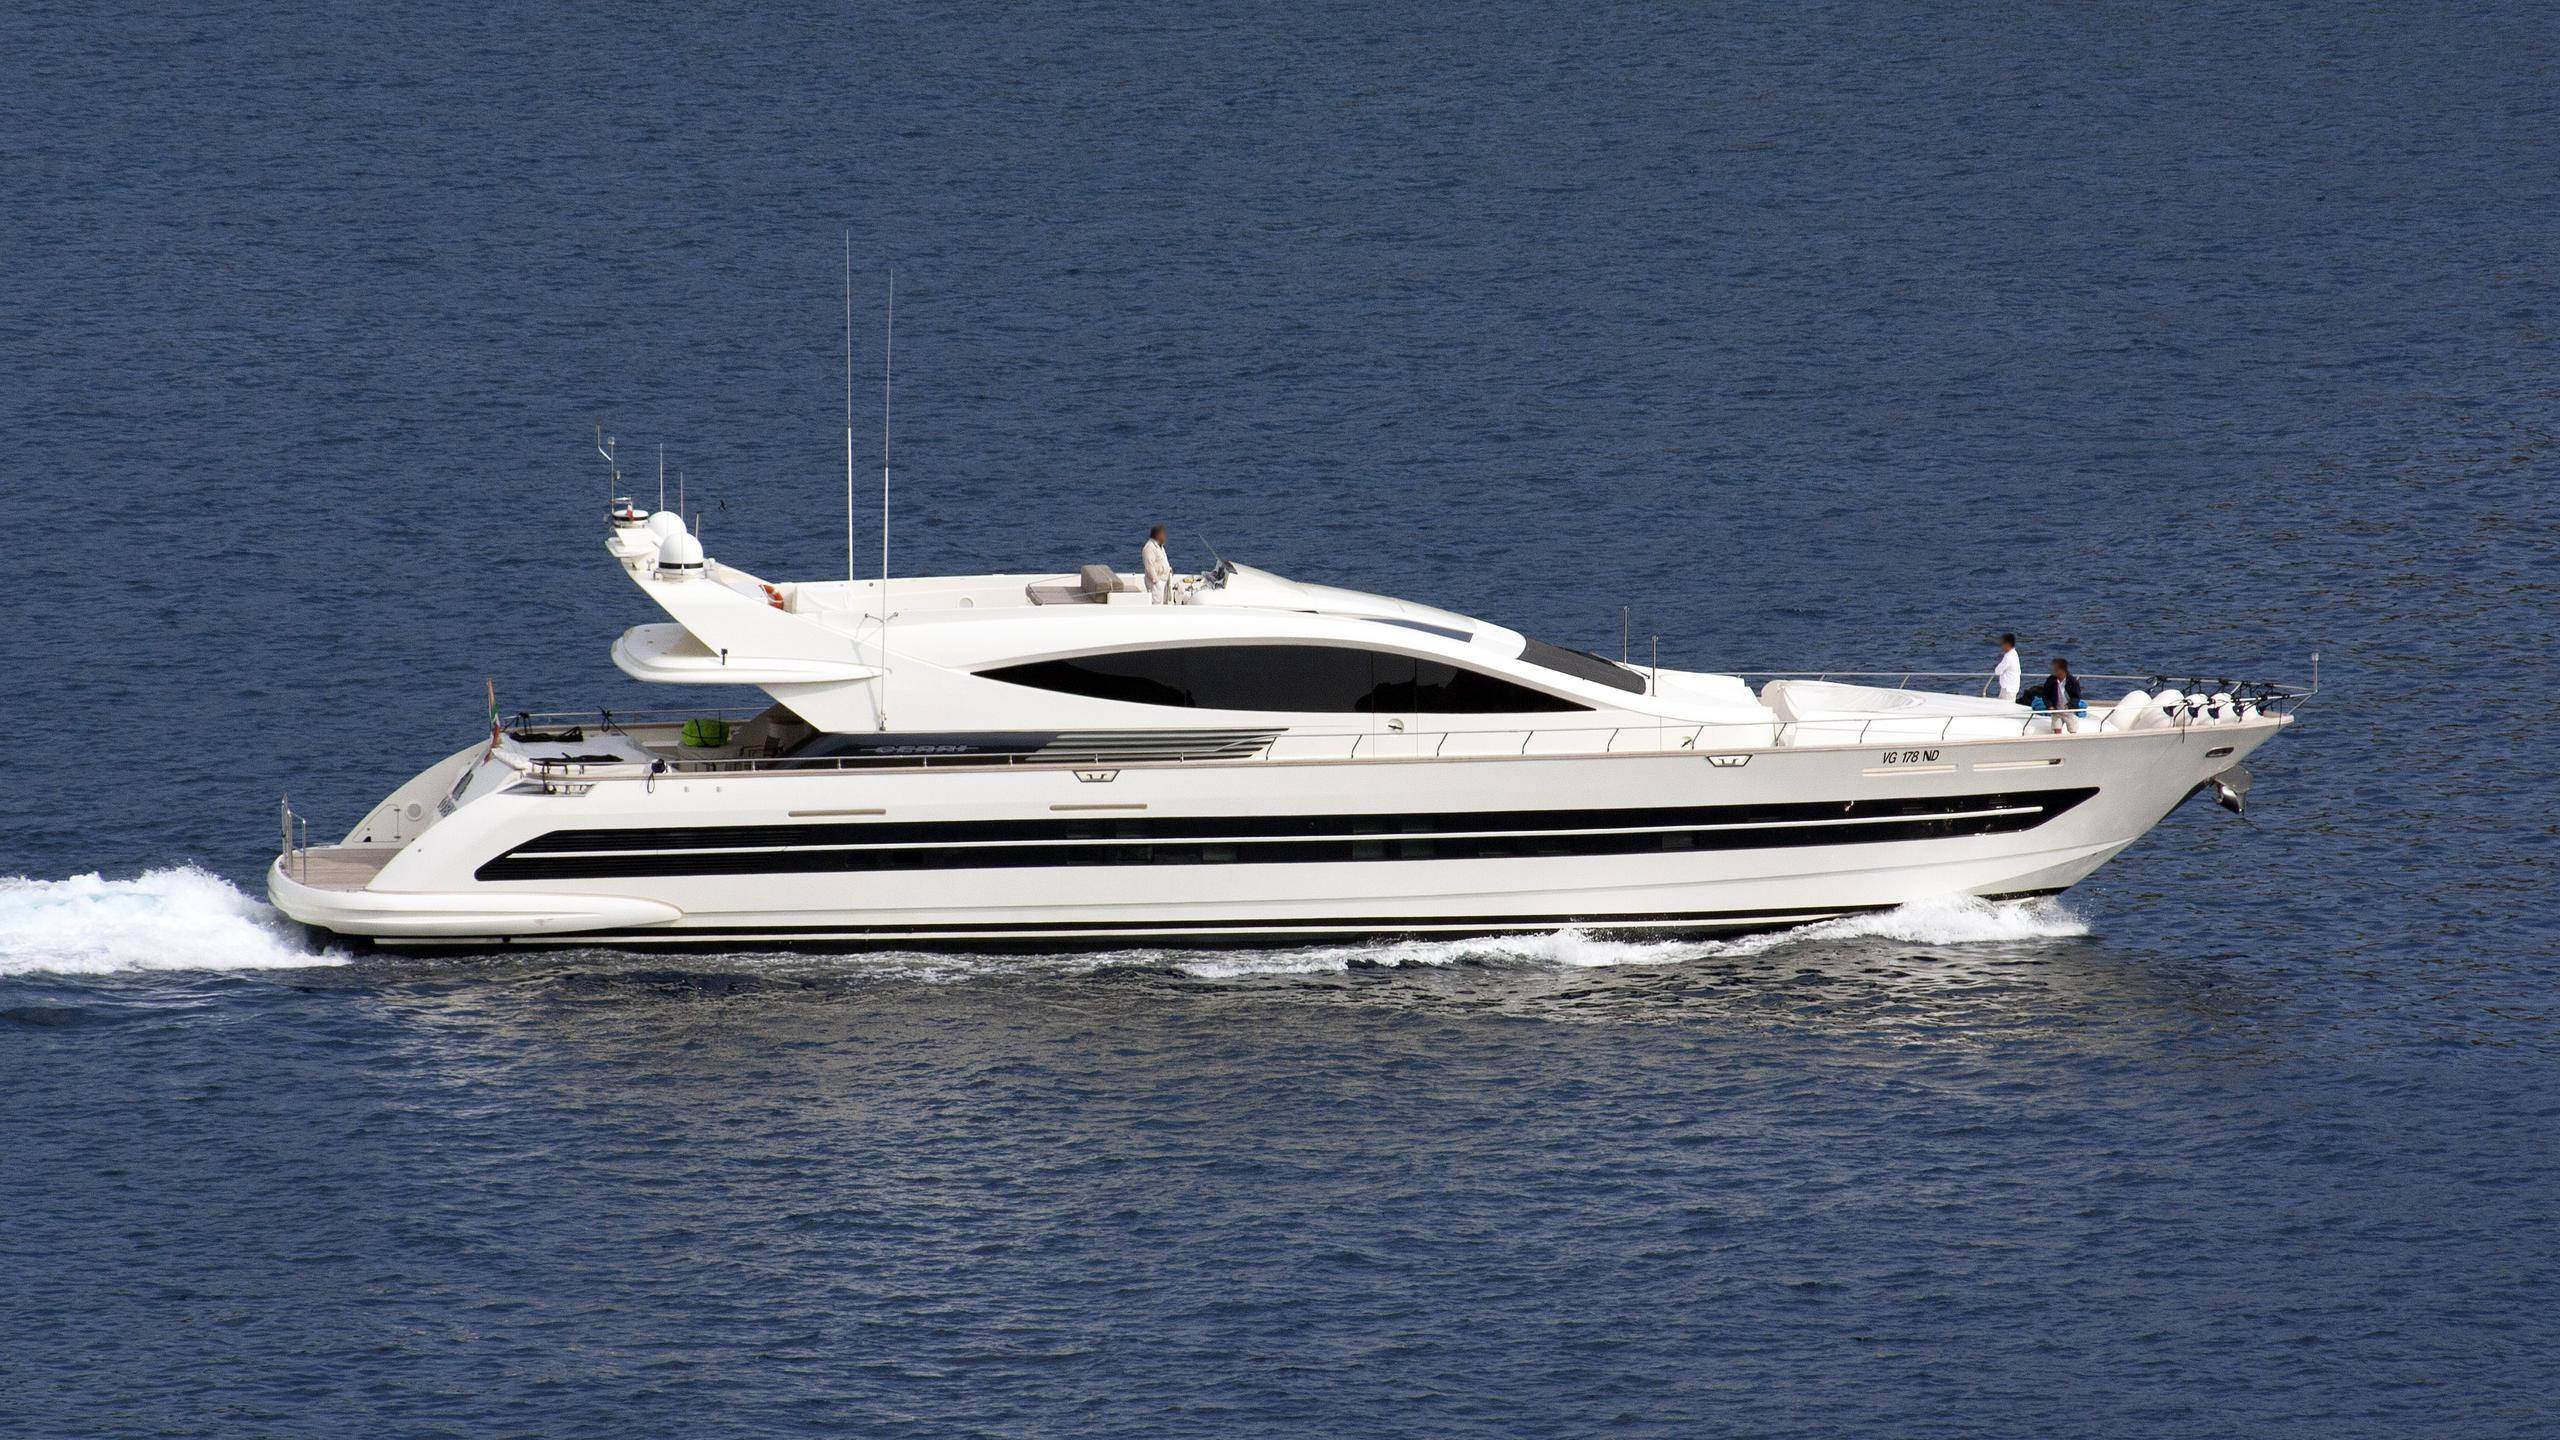 toby-motor-yacht-ceri-cantieri-navali-FlyingSport102-2009-31m-cruising